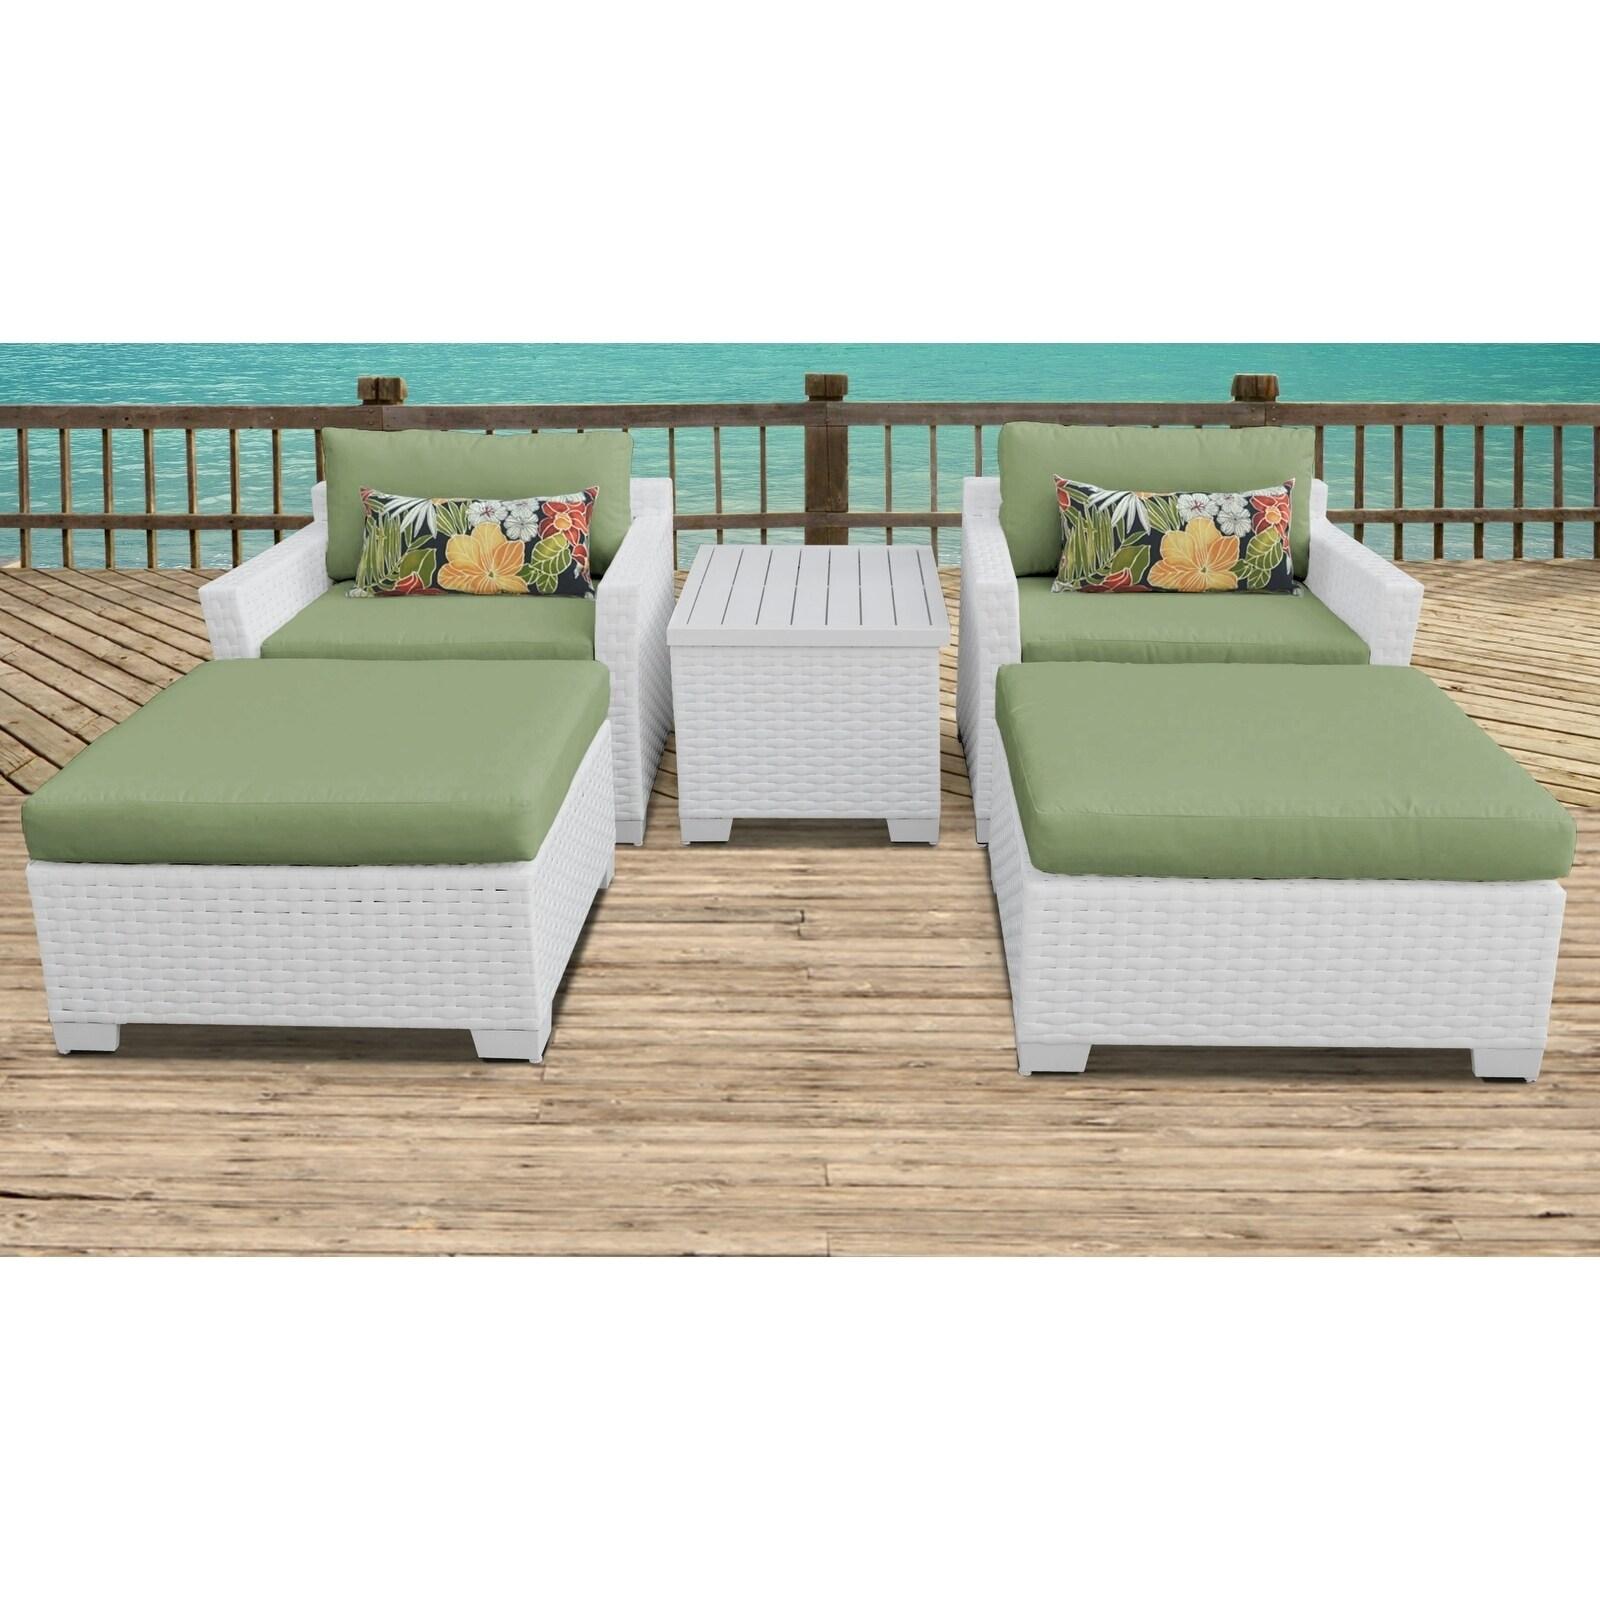 Df Patio Furniture  Best Home Decorating Ideas